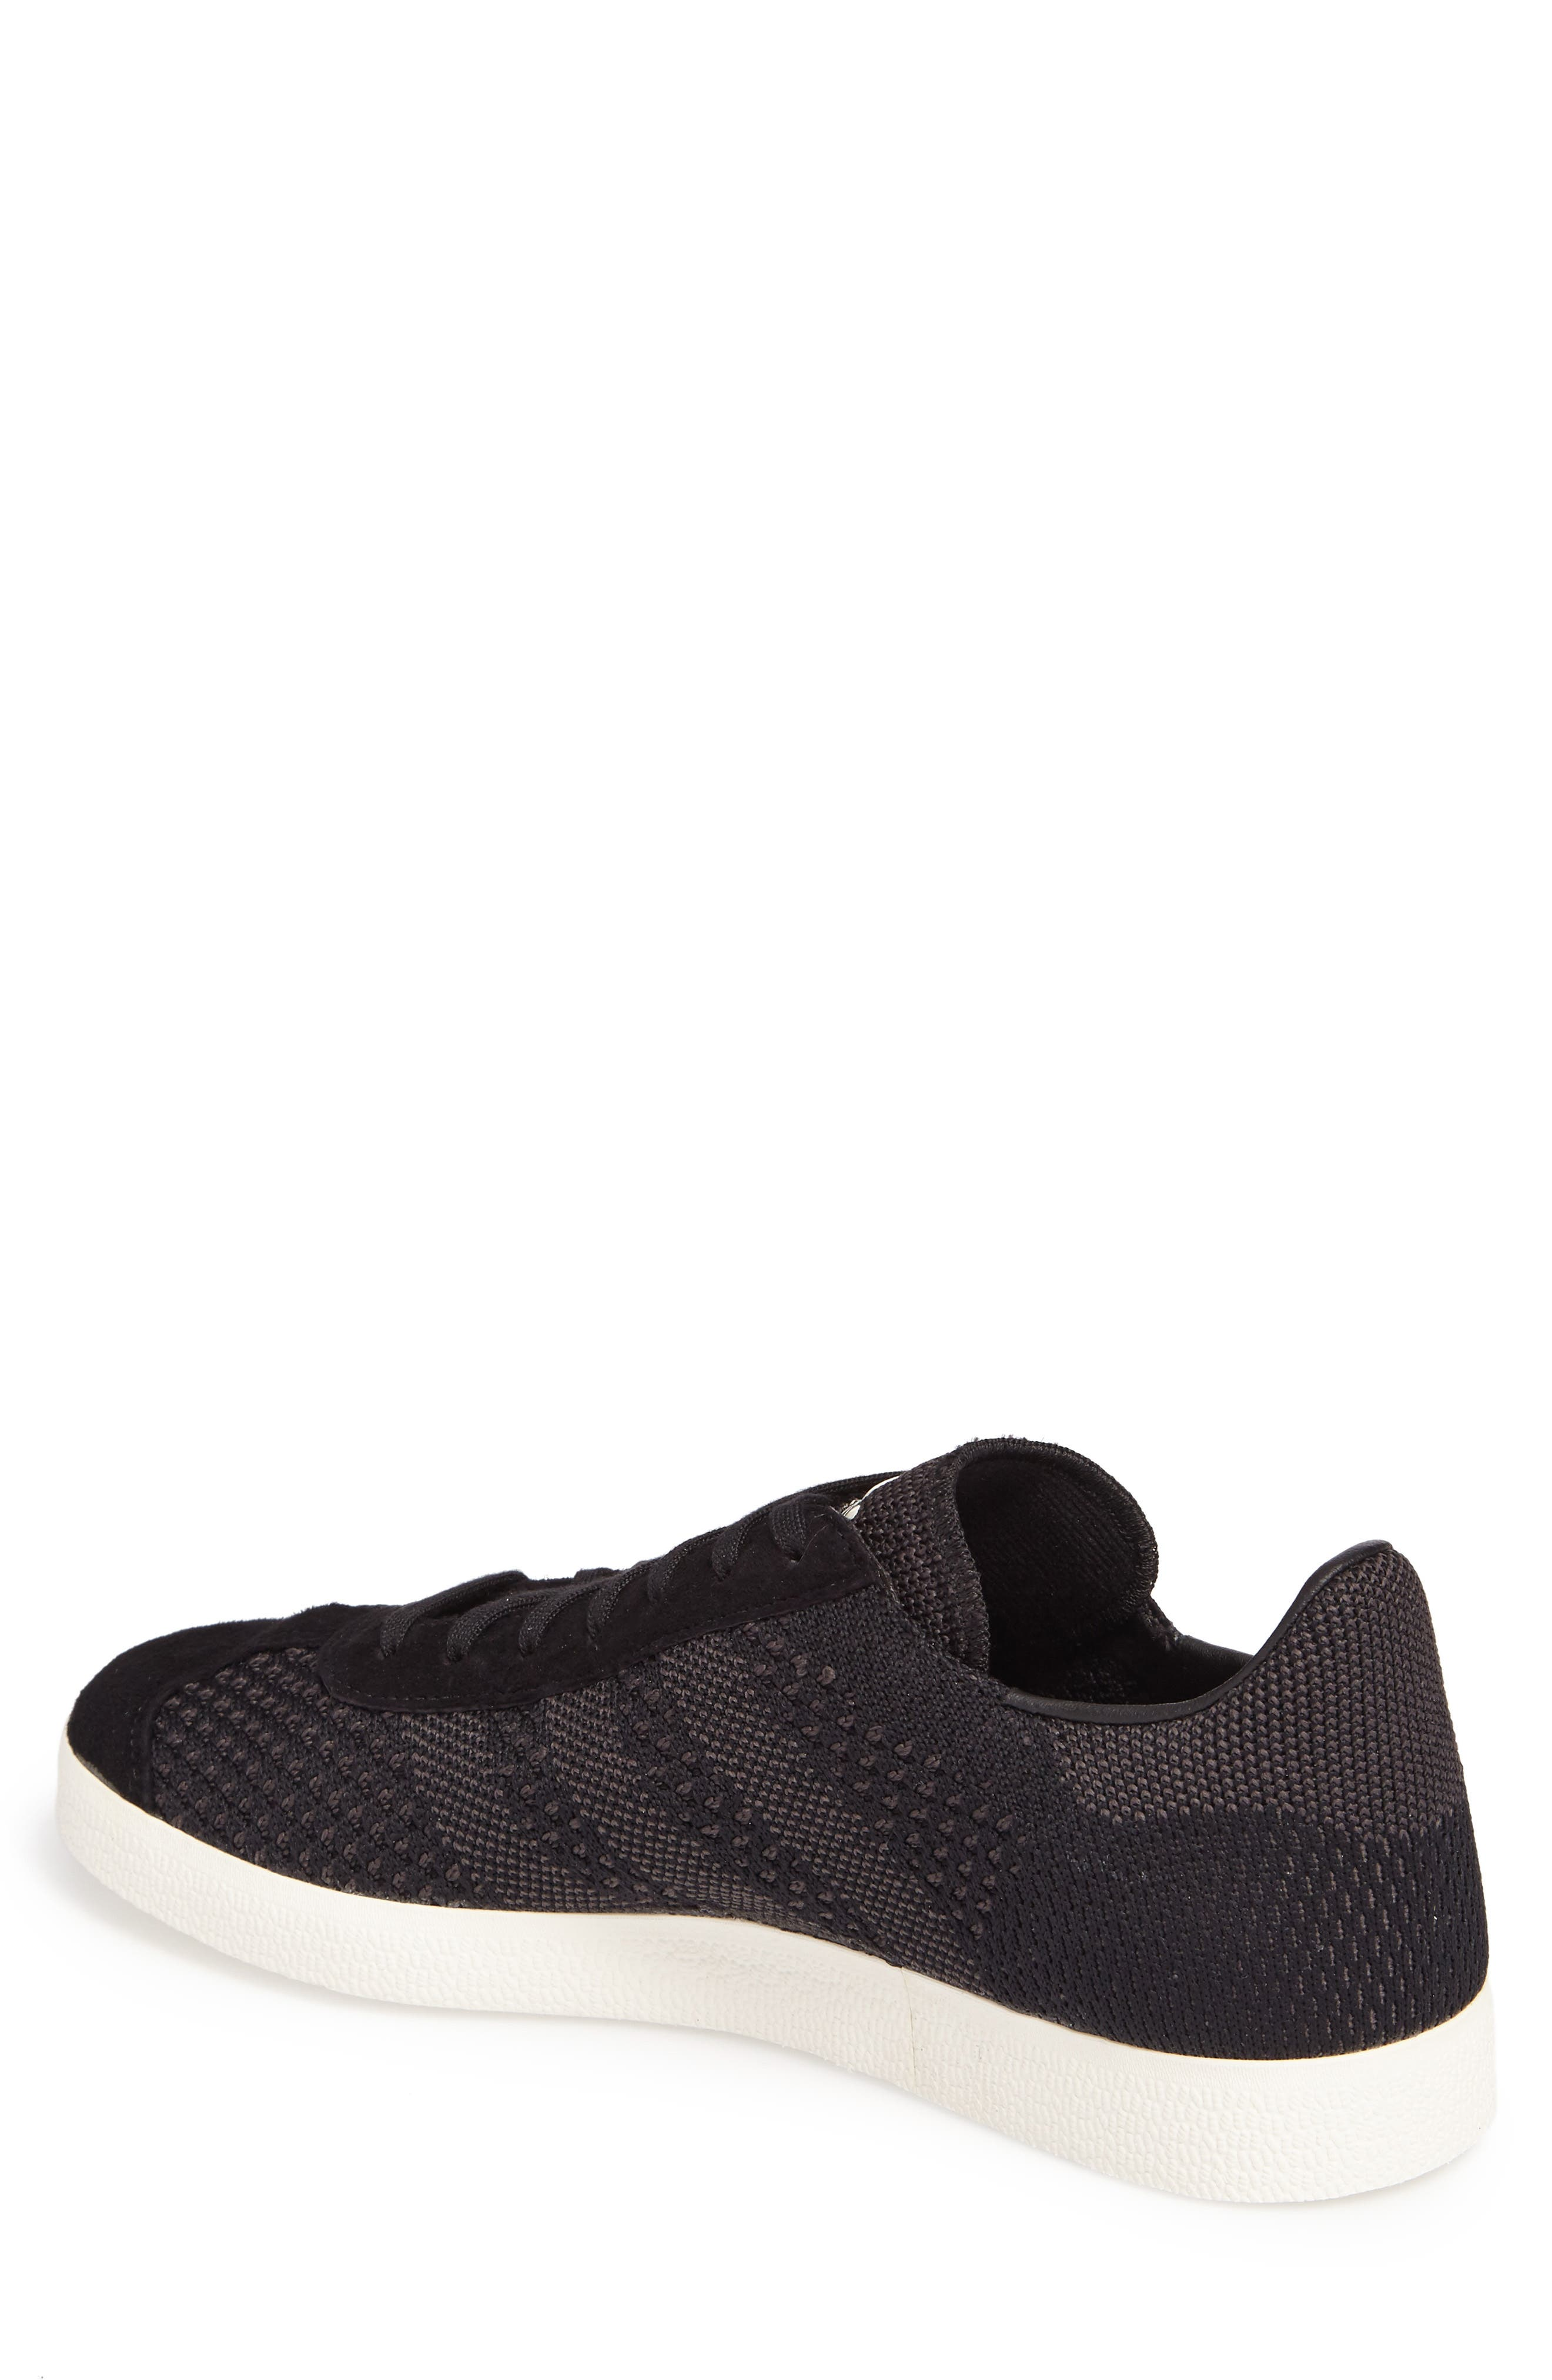 Gazelle Primeknit Sneaker,                             Alternate thumbnail 2, color,                             Core Black/ Off White